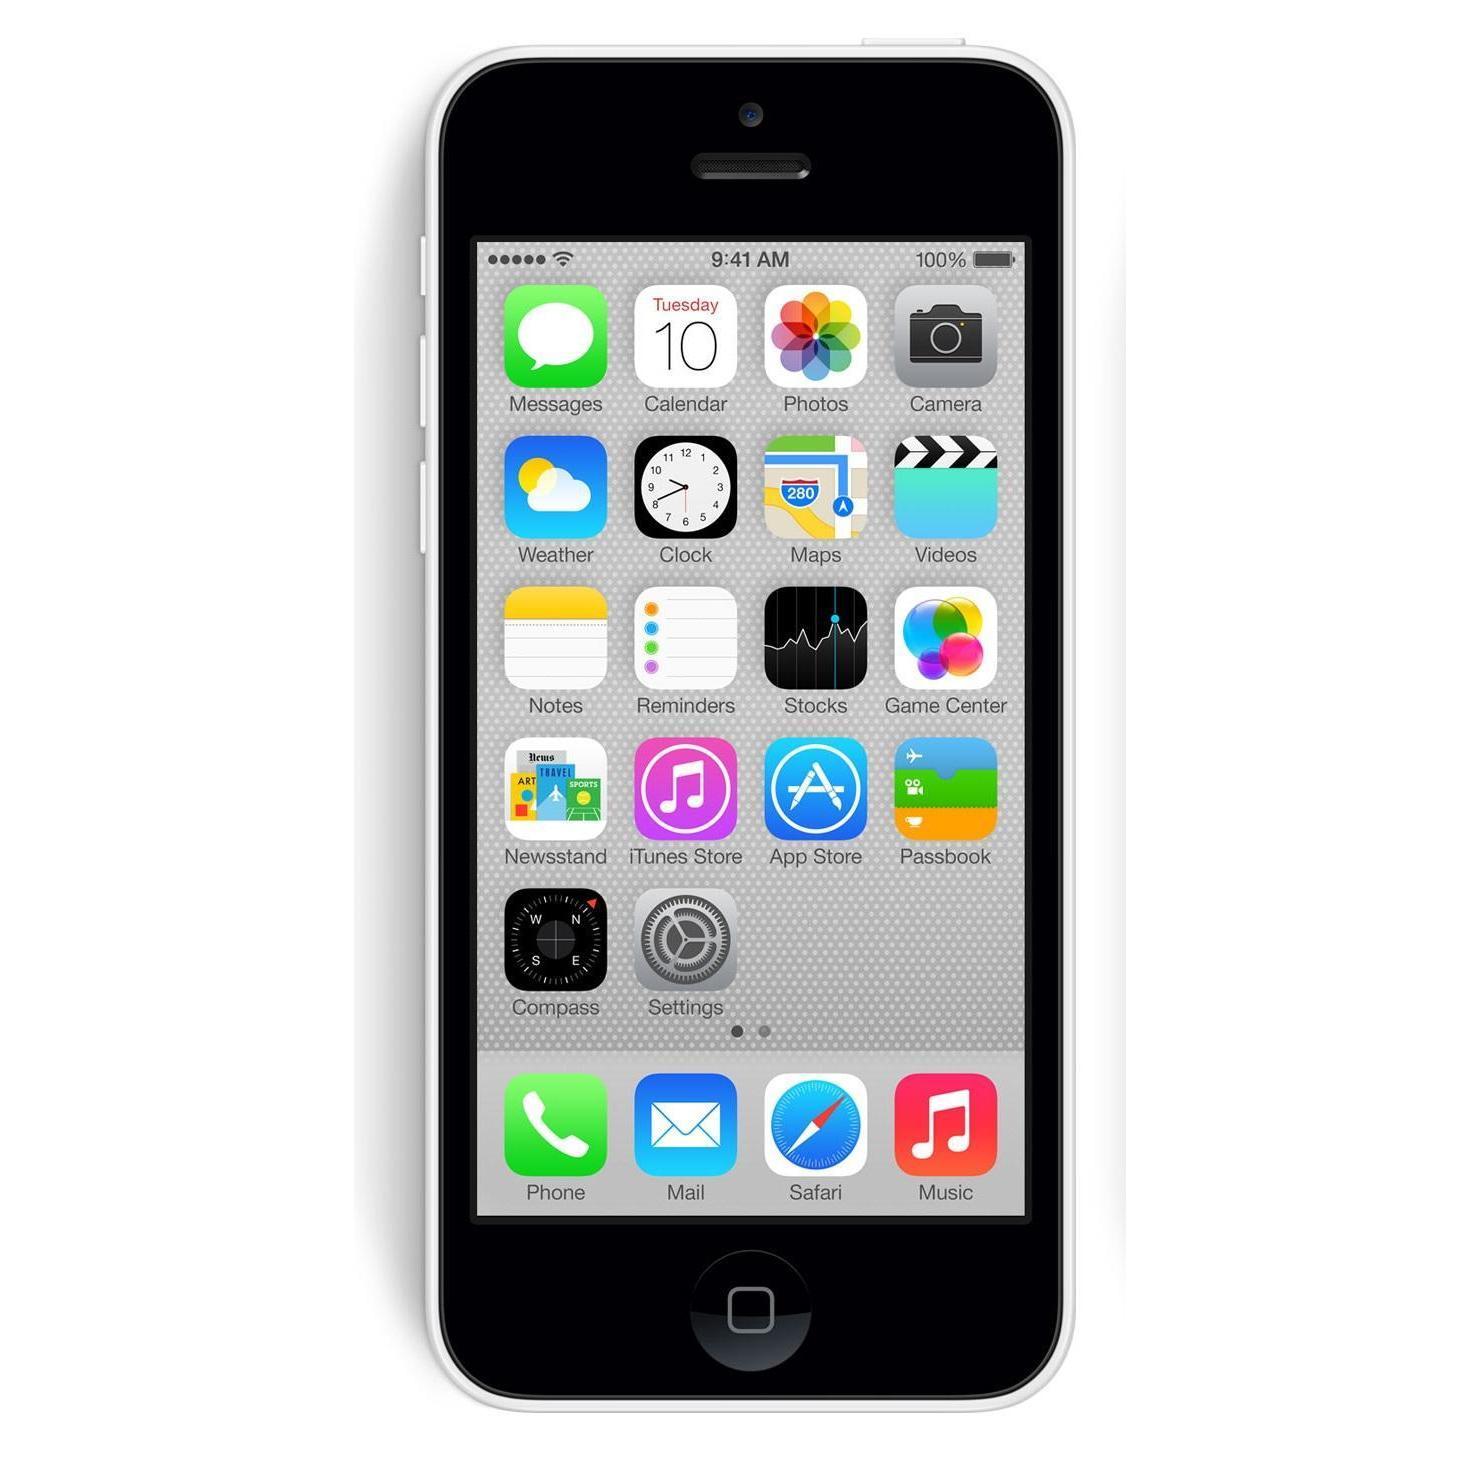 Apple Iphone 5C - 16GB - Verizon (Unlocked) Smartphone - ...